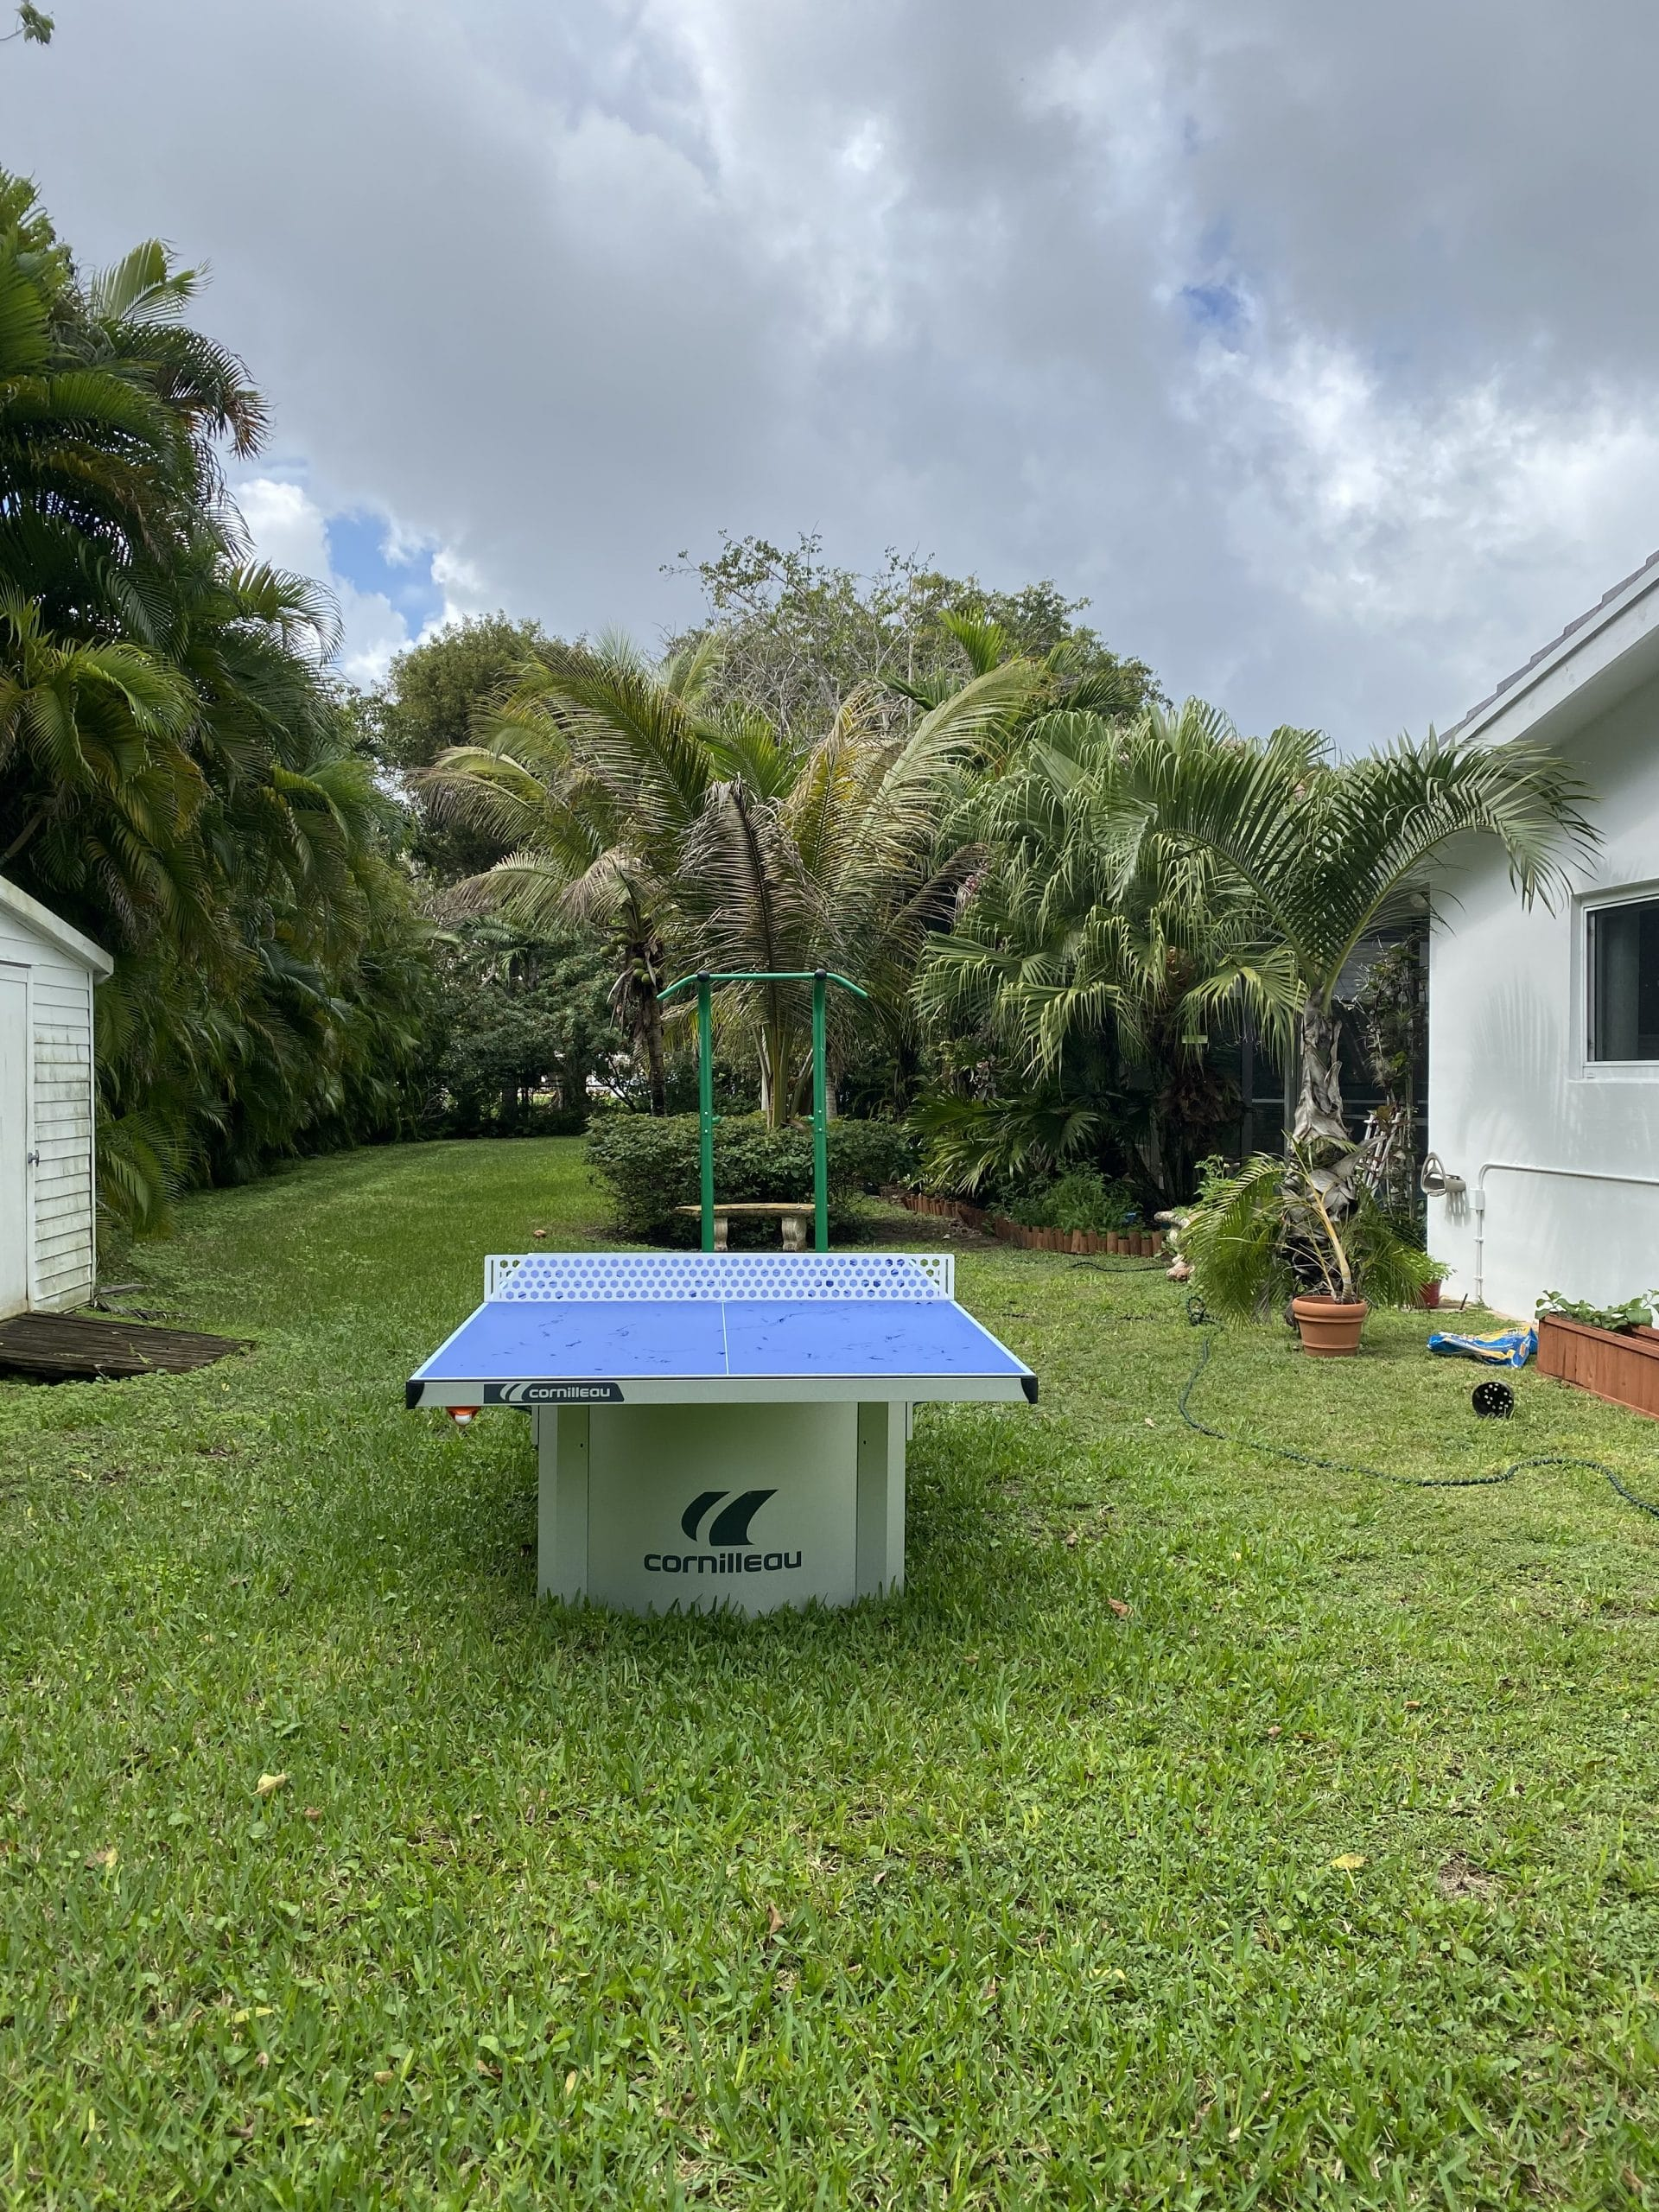 Cornilleau 510 stationary florida backyard